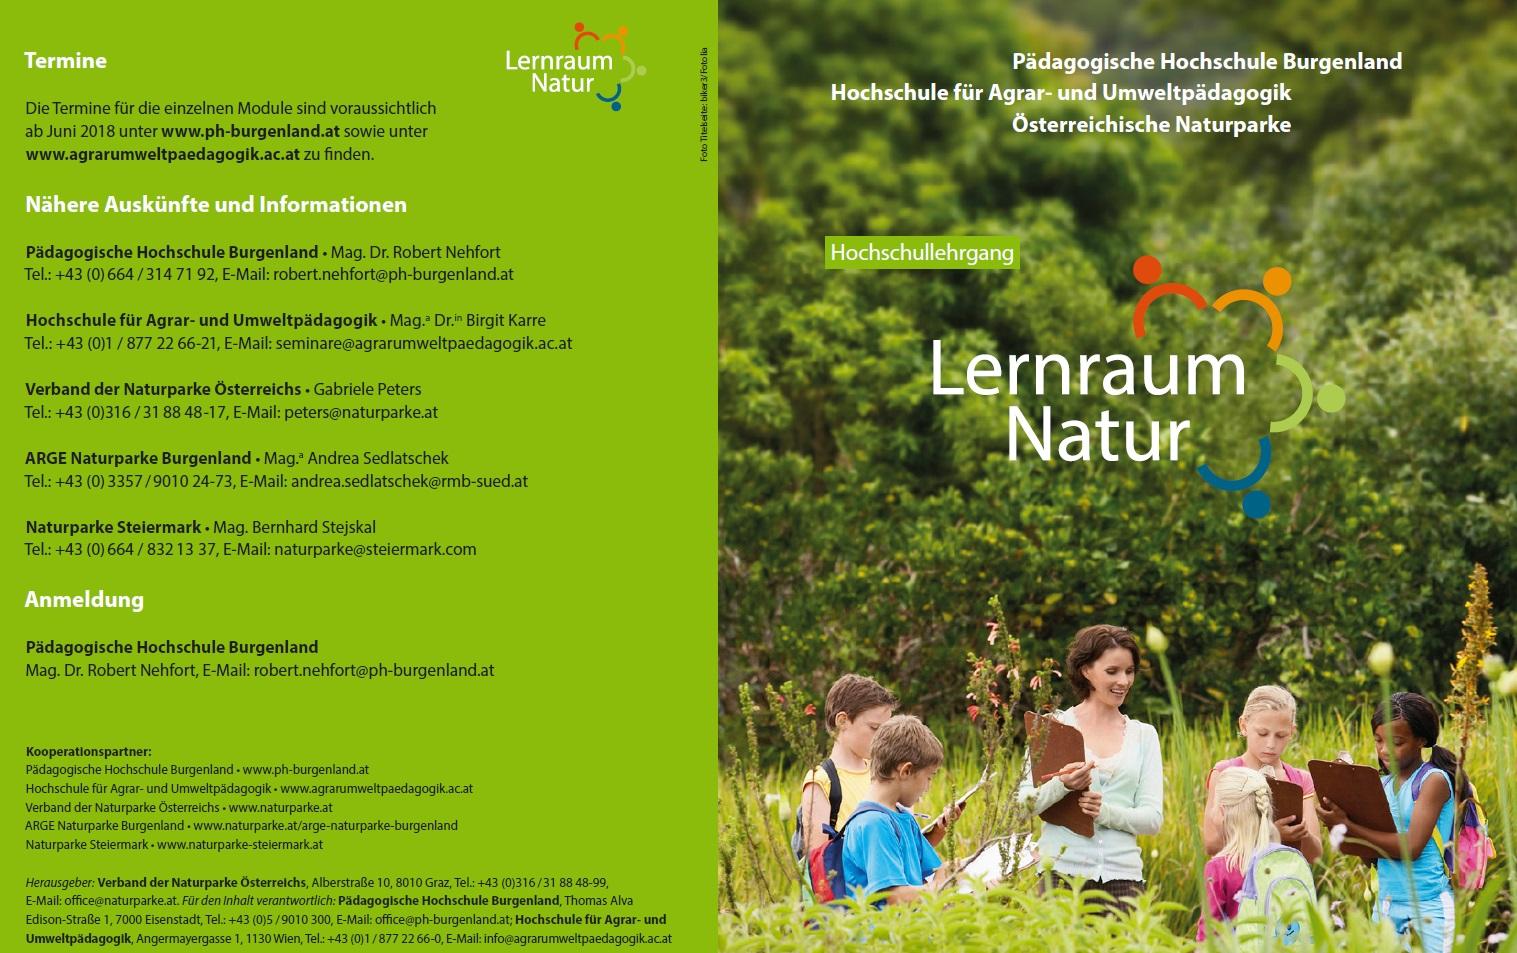 LernraumNatur_Infos